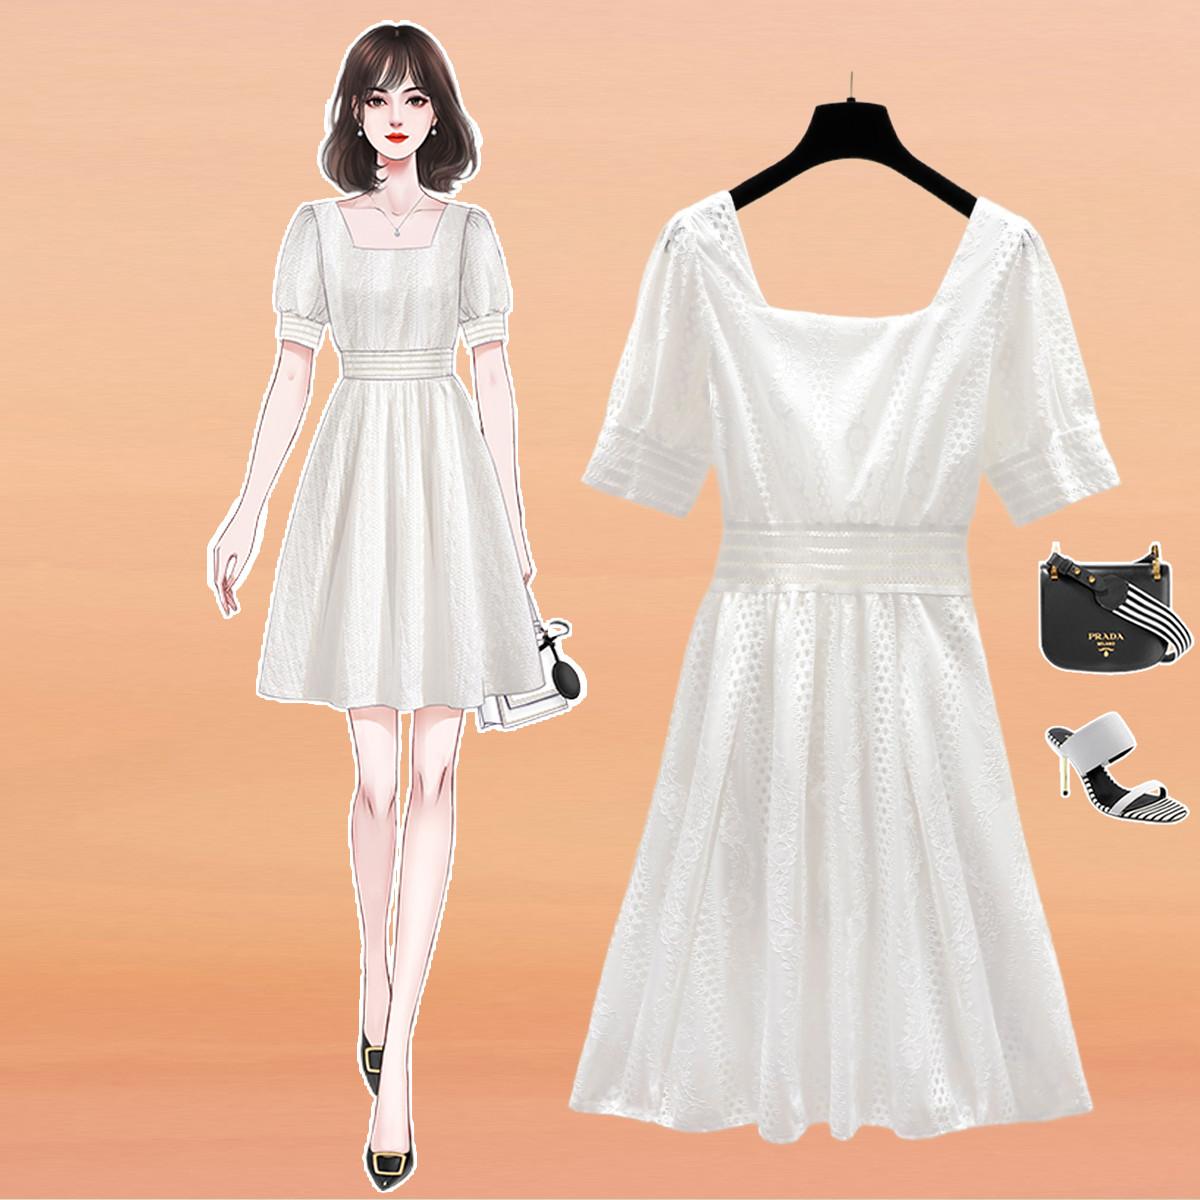 stylecloth 诗可洛 SK-LZBA5387B0  女士连衣裙